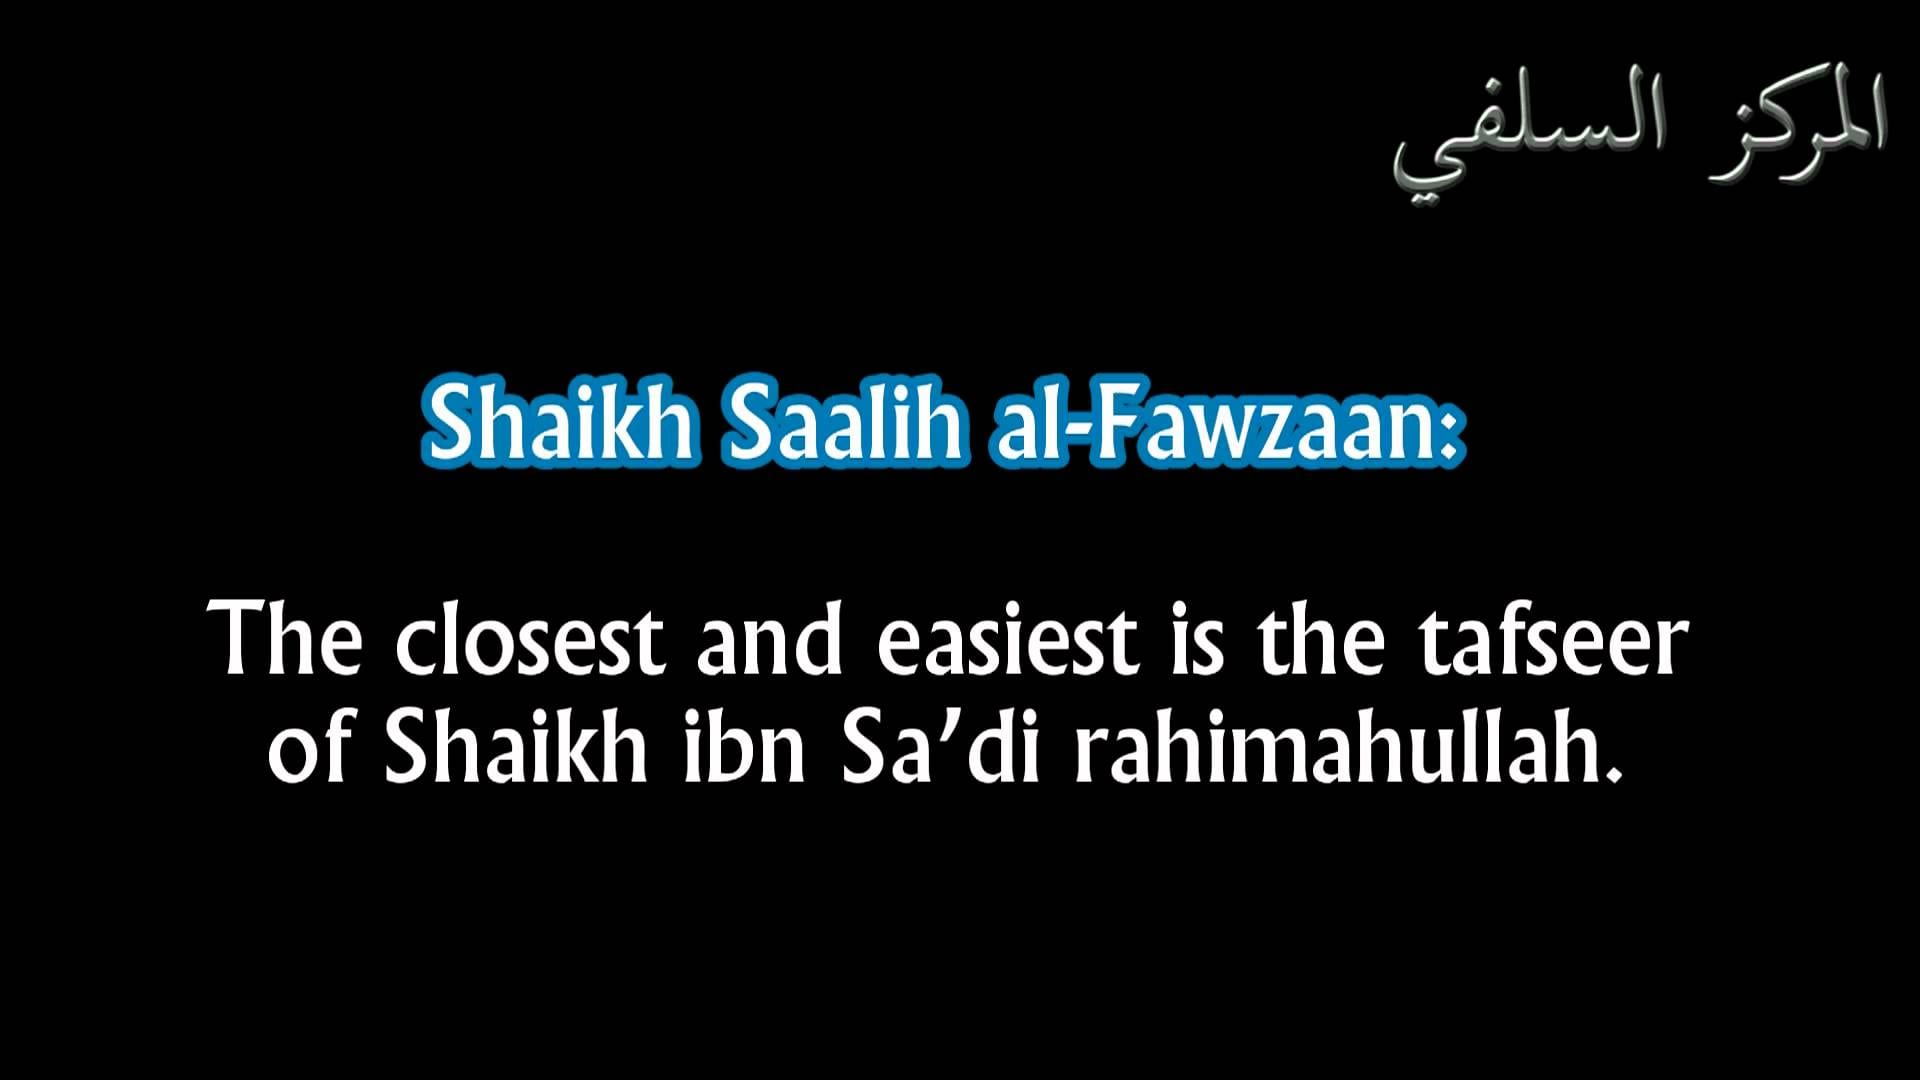 Easiest Tafseer for the Muslim | Shaikh Saalih al-Fawzaan